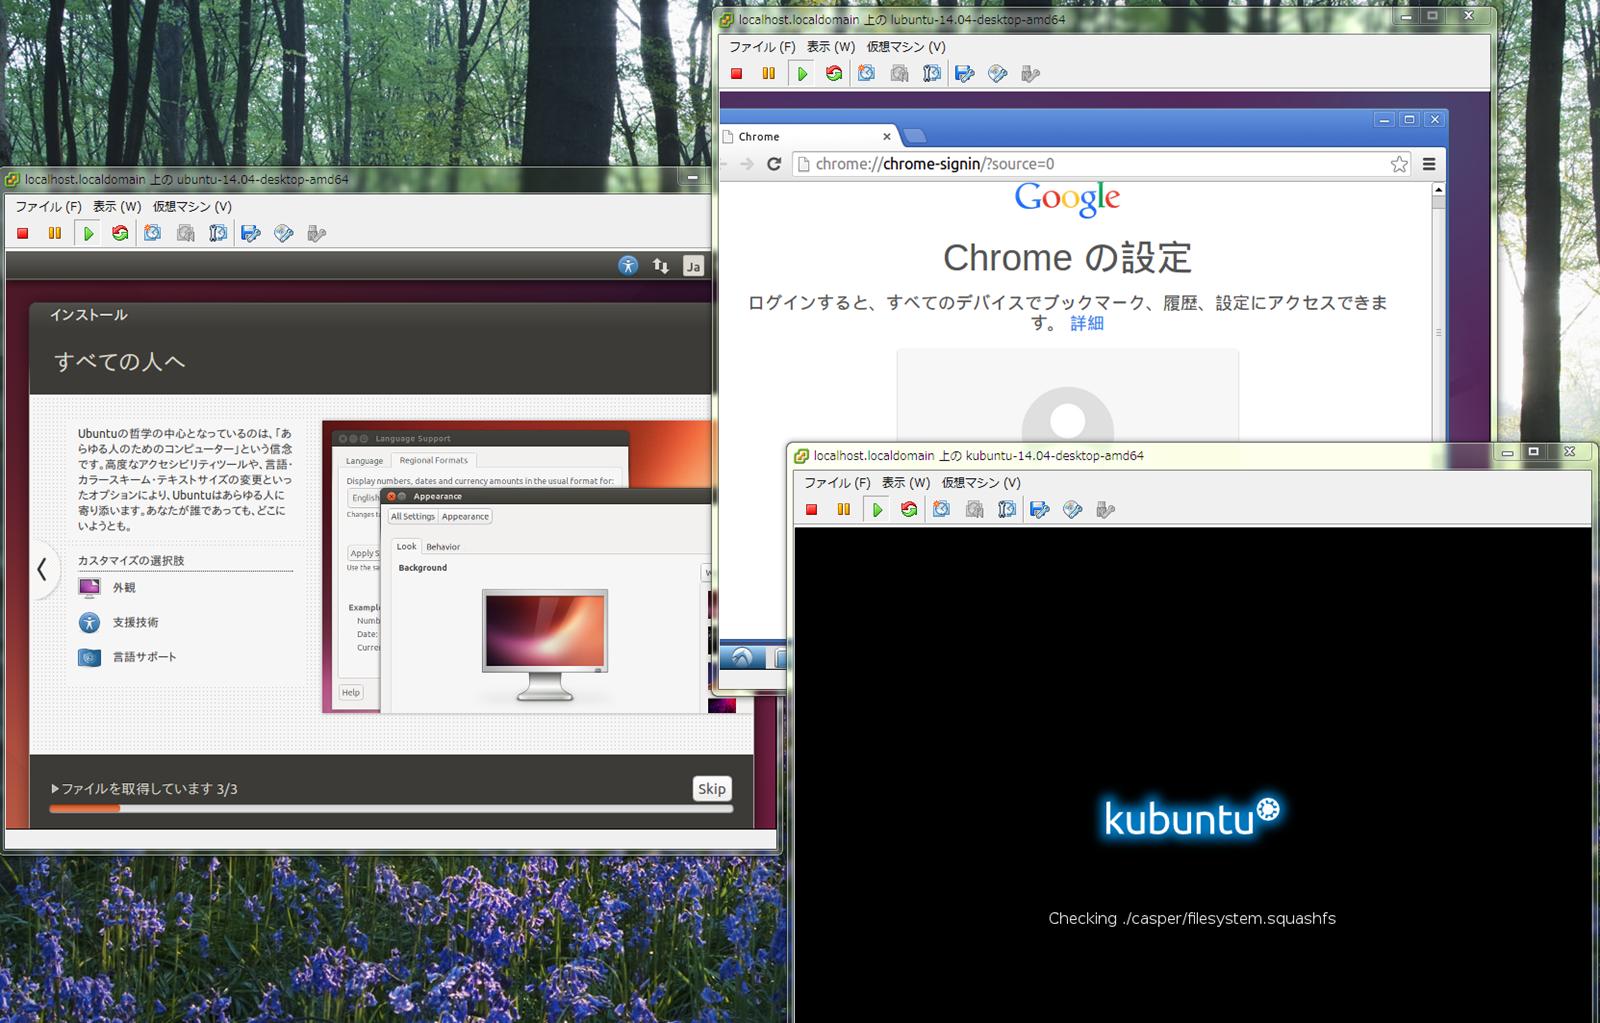 Ubuntuファミリーをトライ!